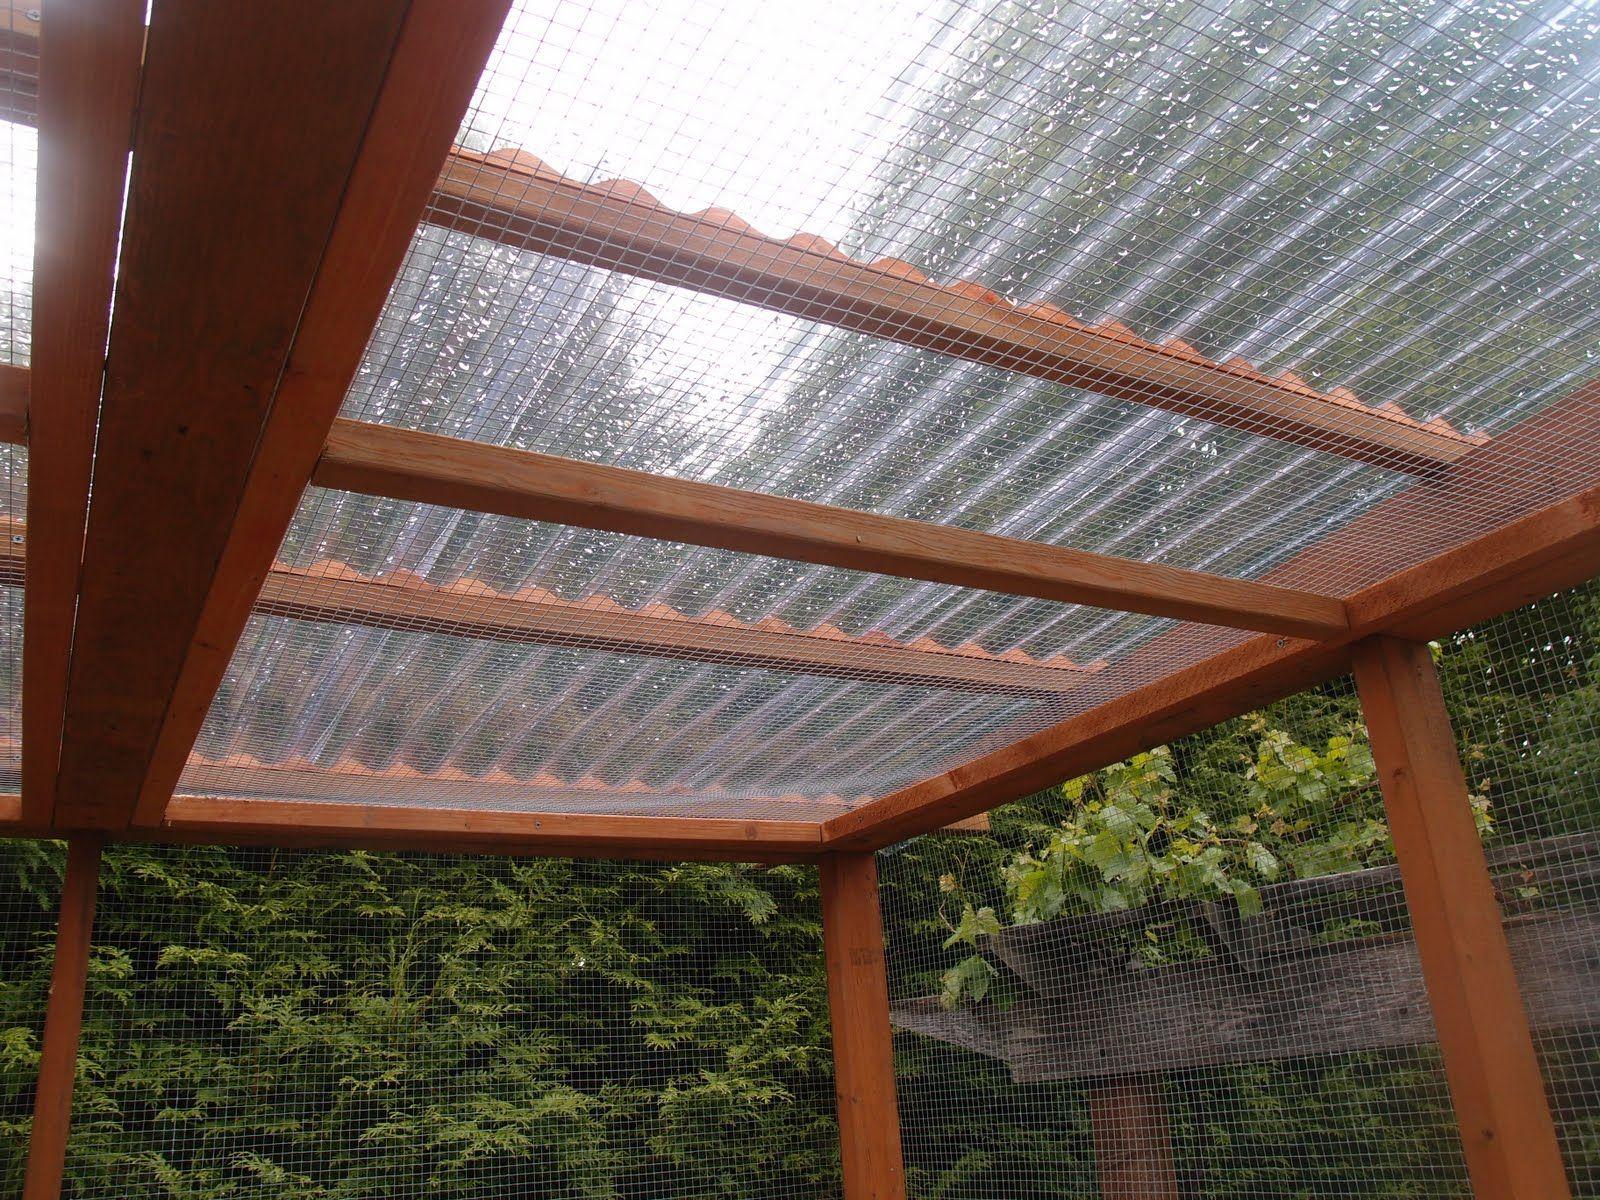 Framing For Ceiling Hardware Cloth Pergola Pergola With Roof Backyard Pergola